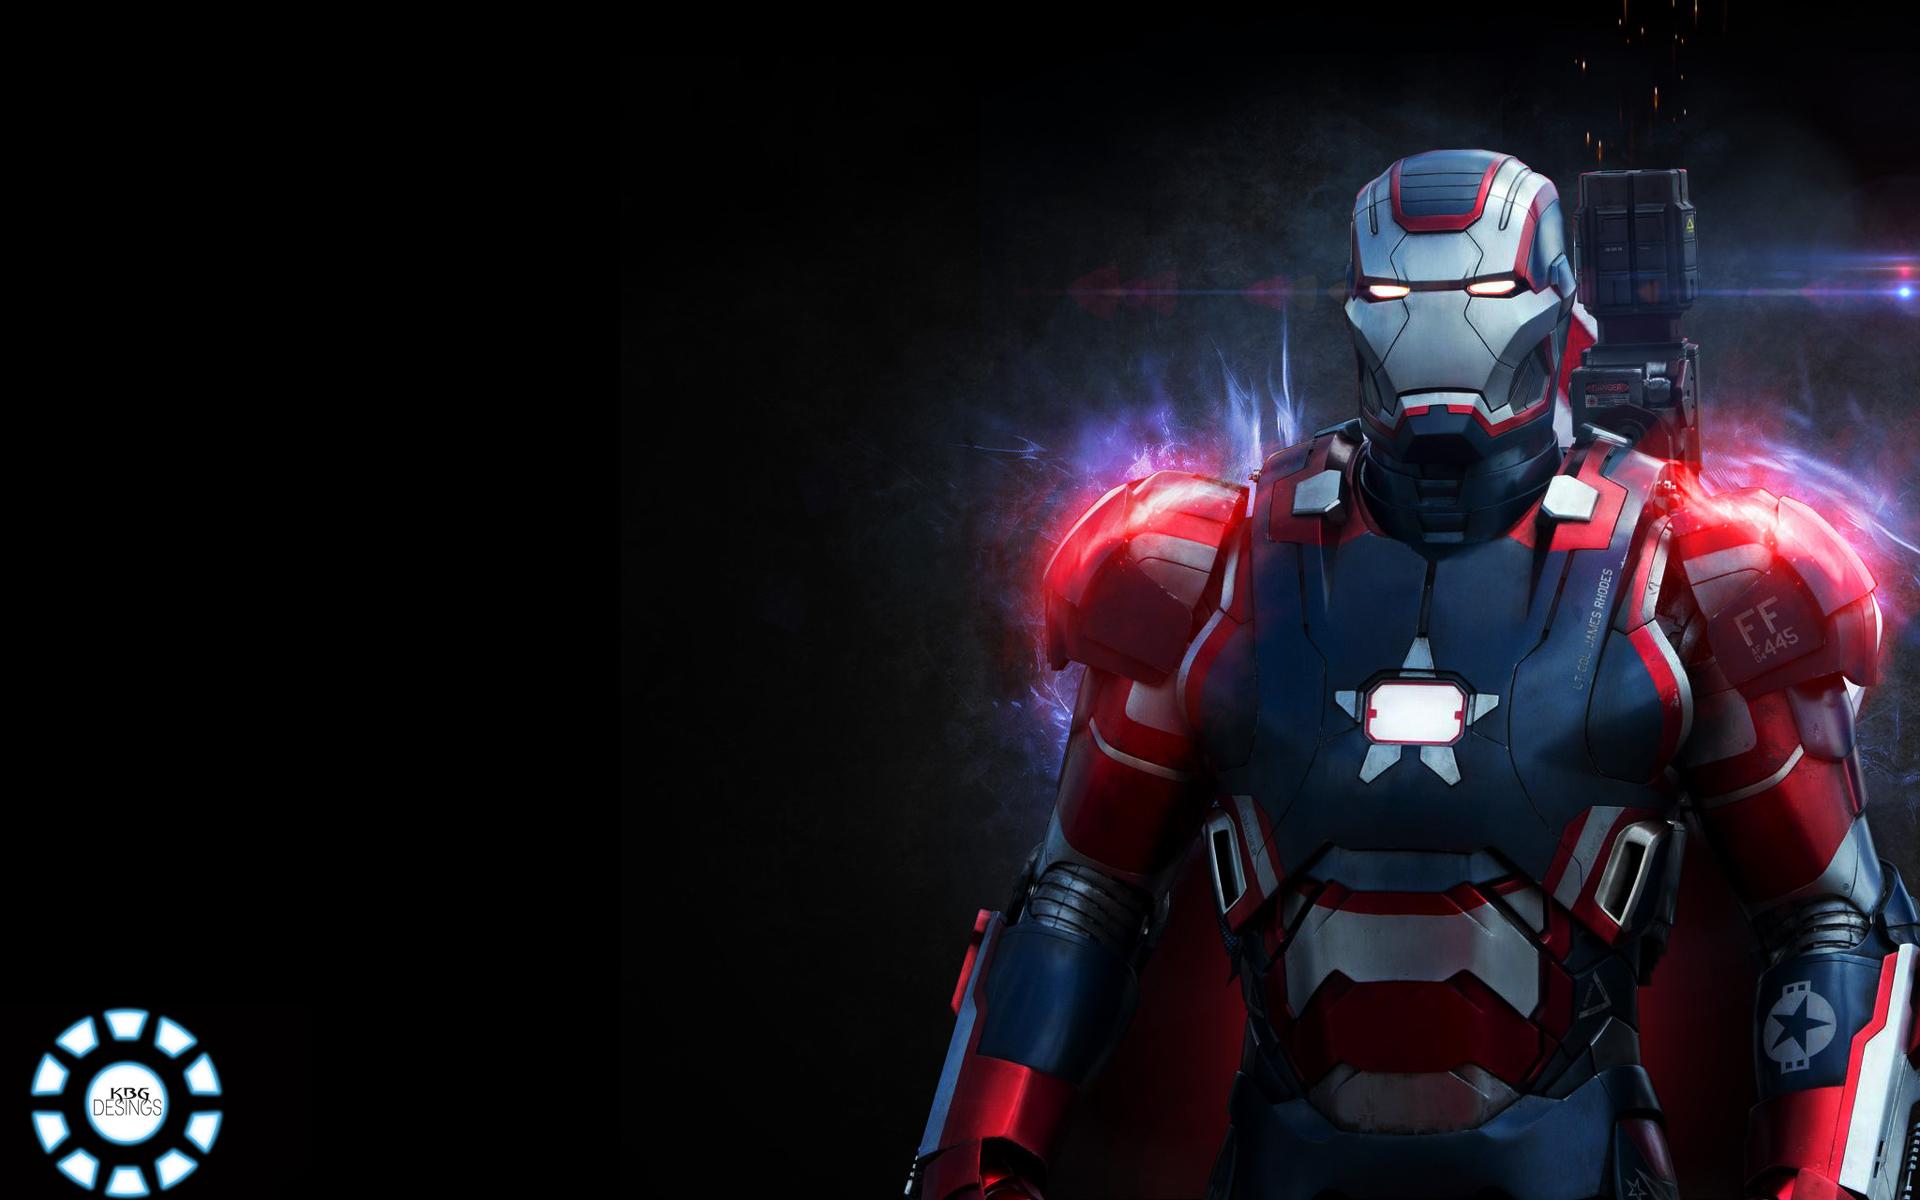 Iron Man 3 Wallpaper Hd Wallpapersafari